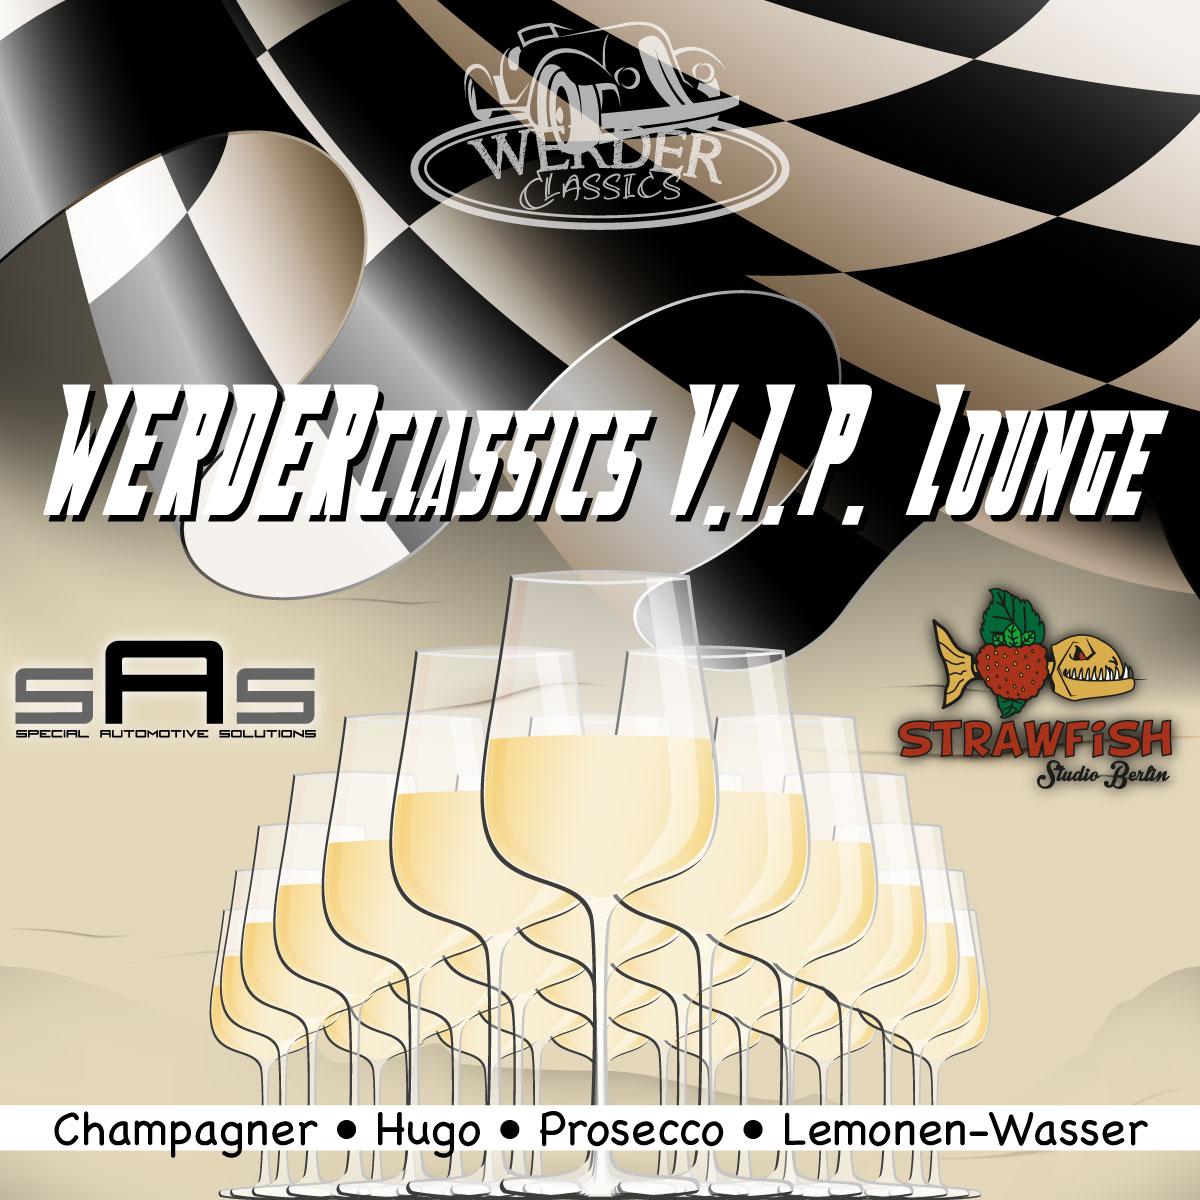 Die WERDERclassics V.I.P. Lounge